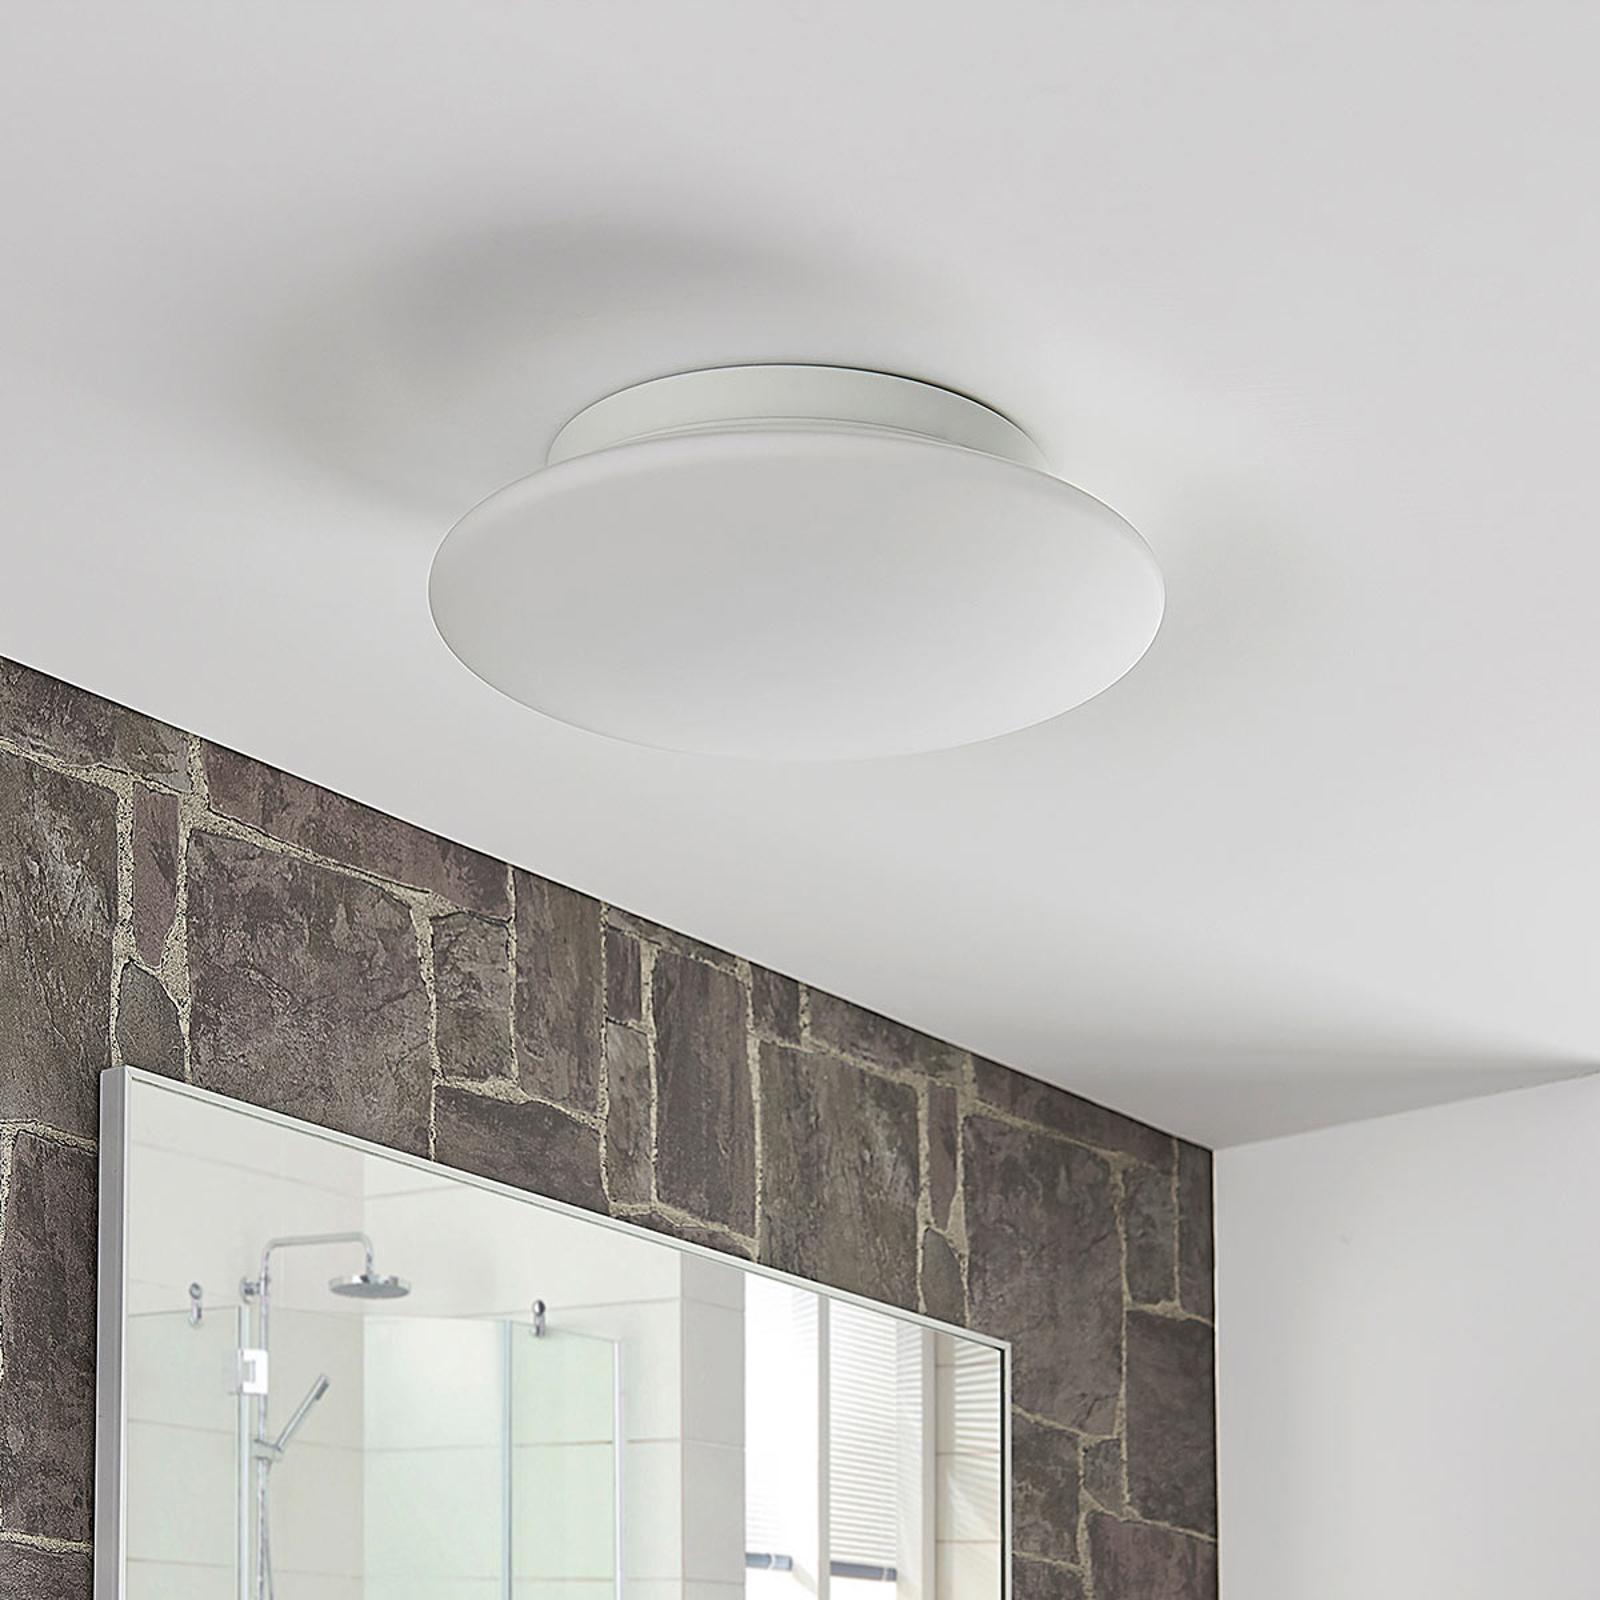 Runde Glas-LED-Deckenleuchte Toan, IP44 dimmbar